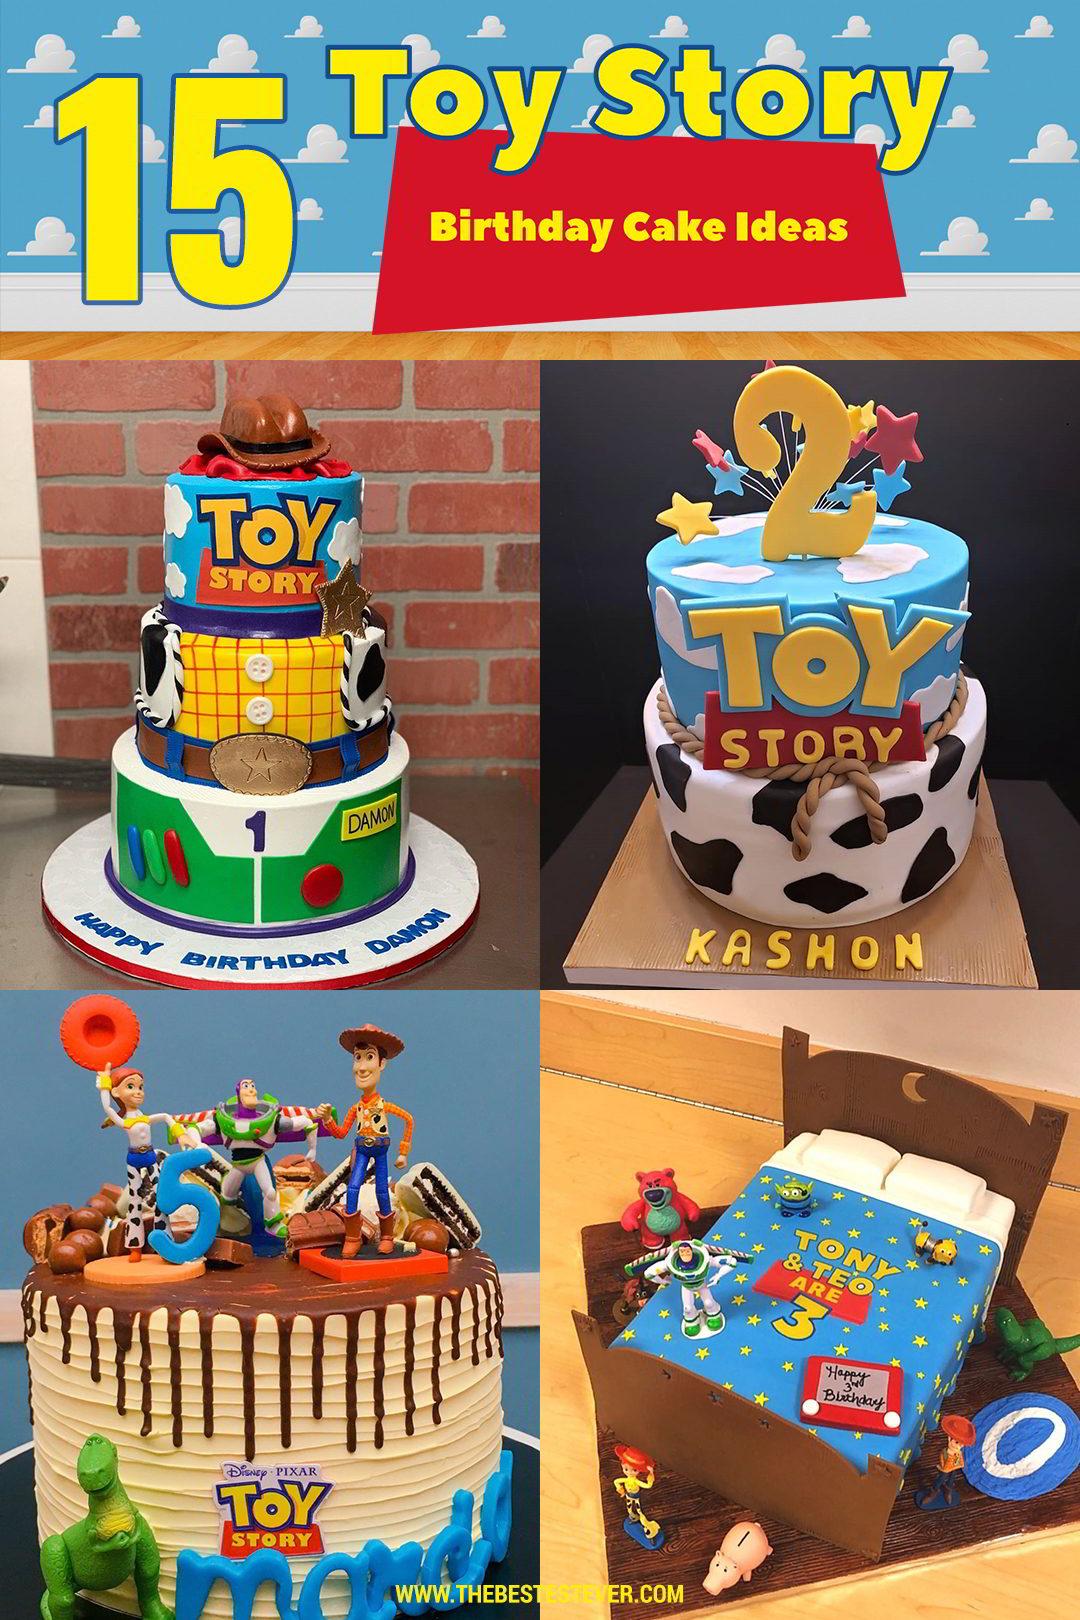 15 Amazing Toy Story Cake Ideas & Designs